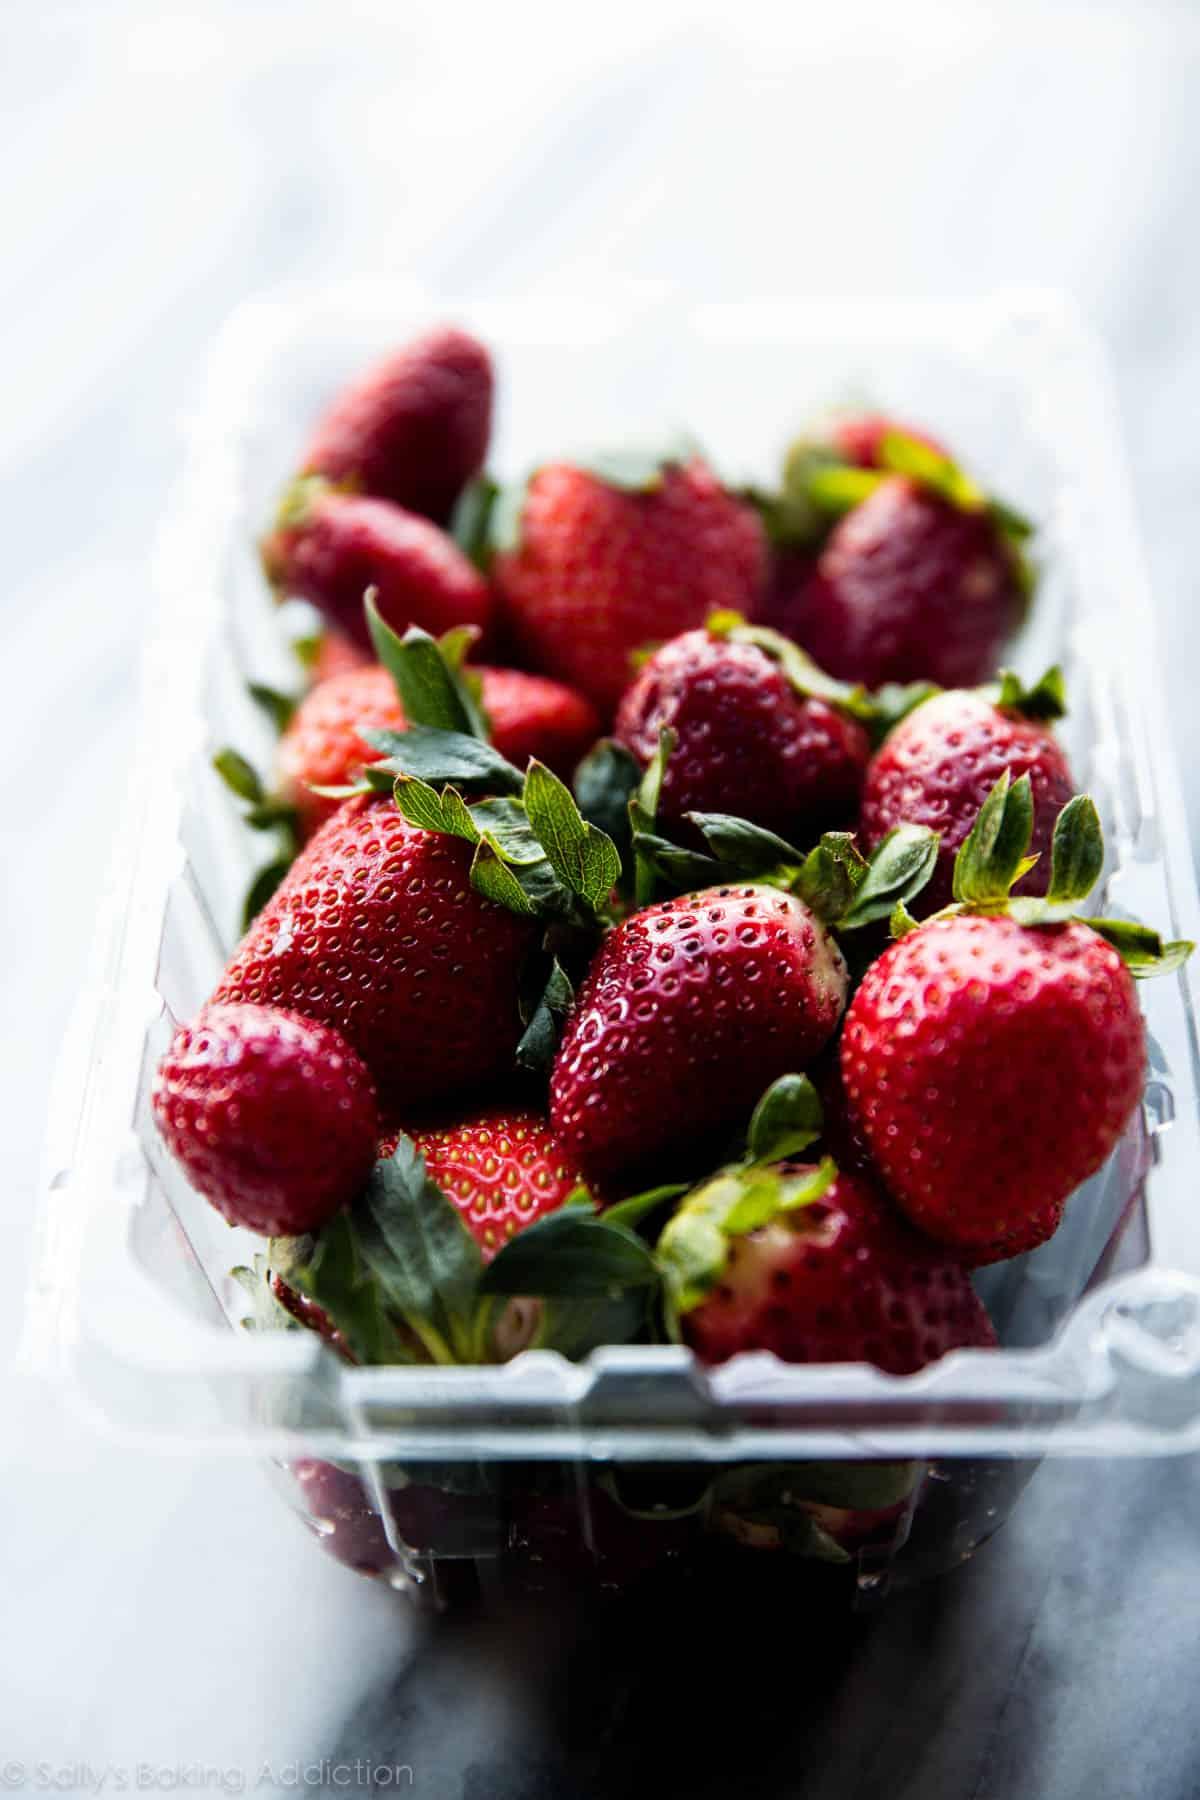 Fresh strawberries on sallysbakingaddiction.com